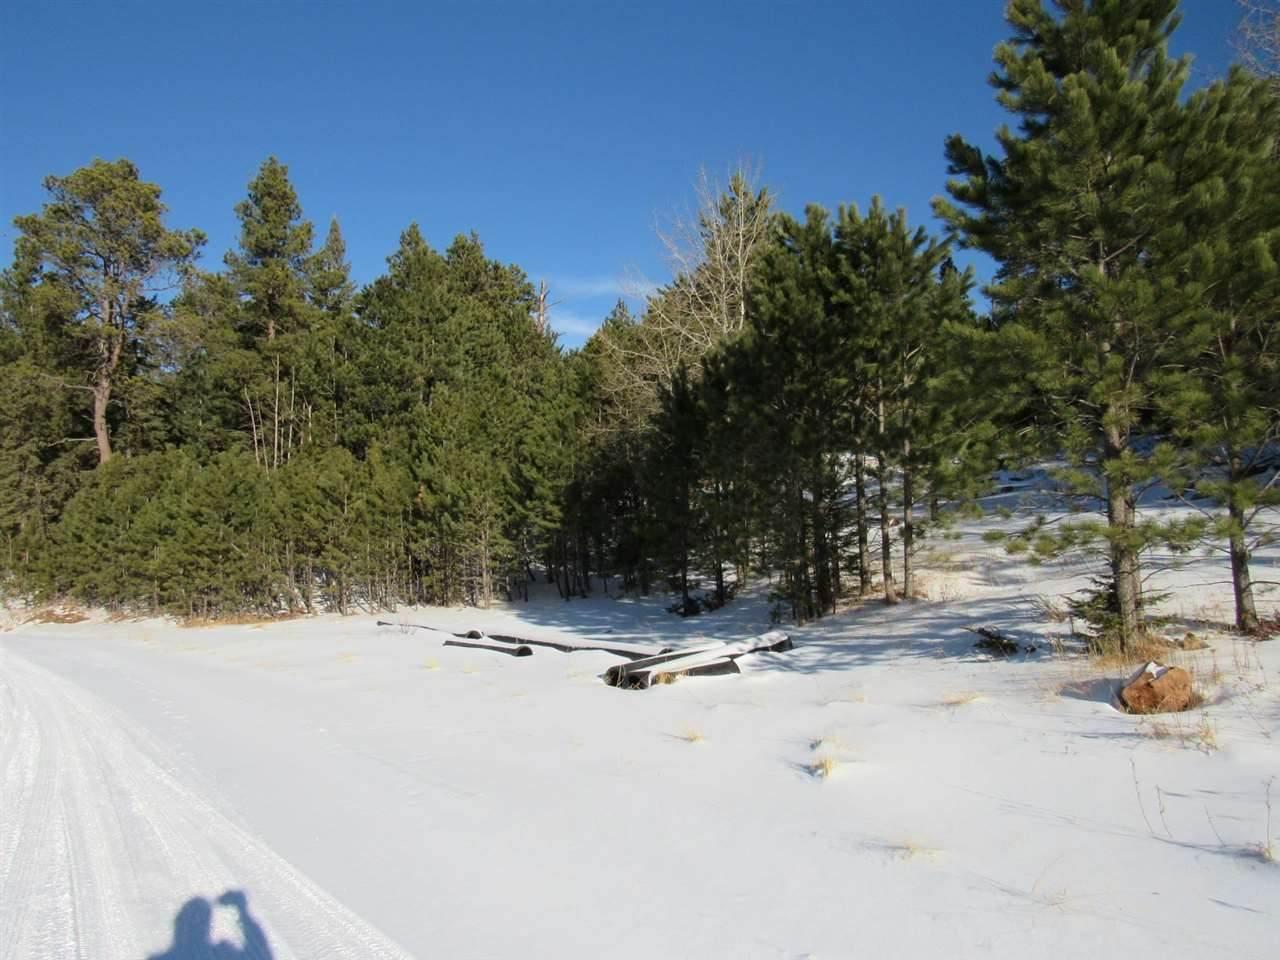 TBD Lot 46 Snowcat Road - Photo 1